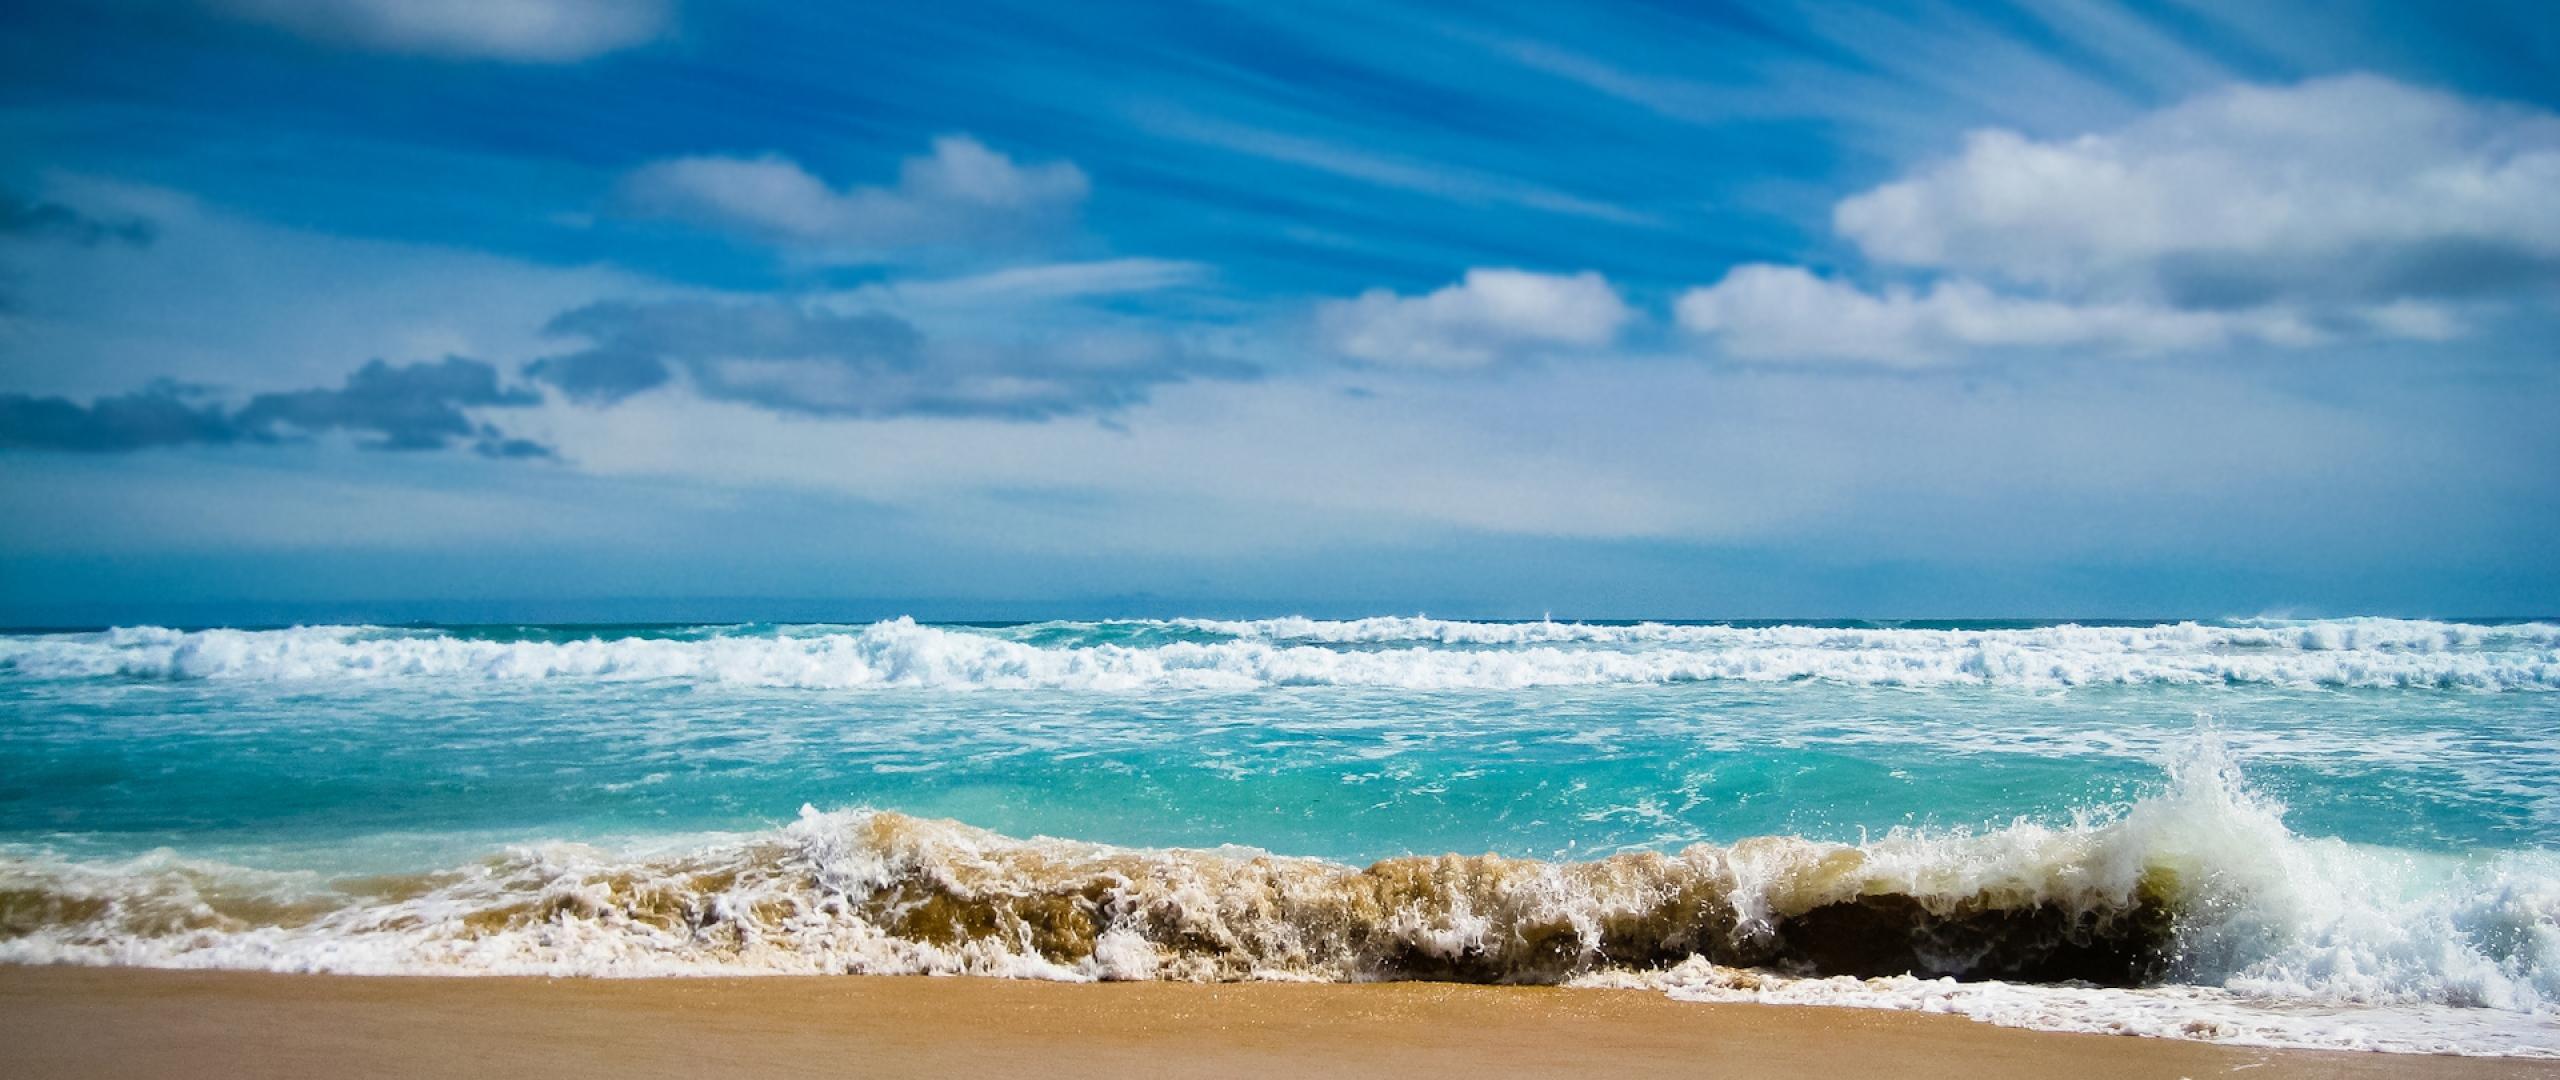 Download Wallpaper 2560x1080 ocean sea gulf waves blue water 2560x1080